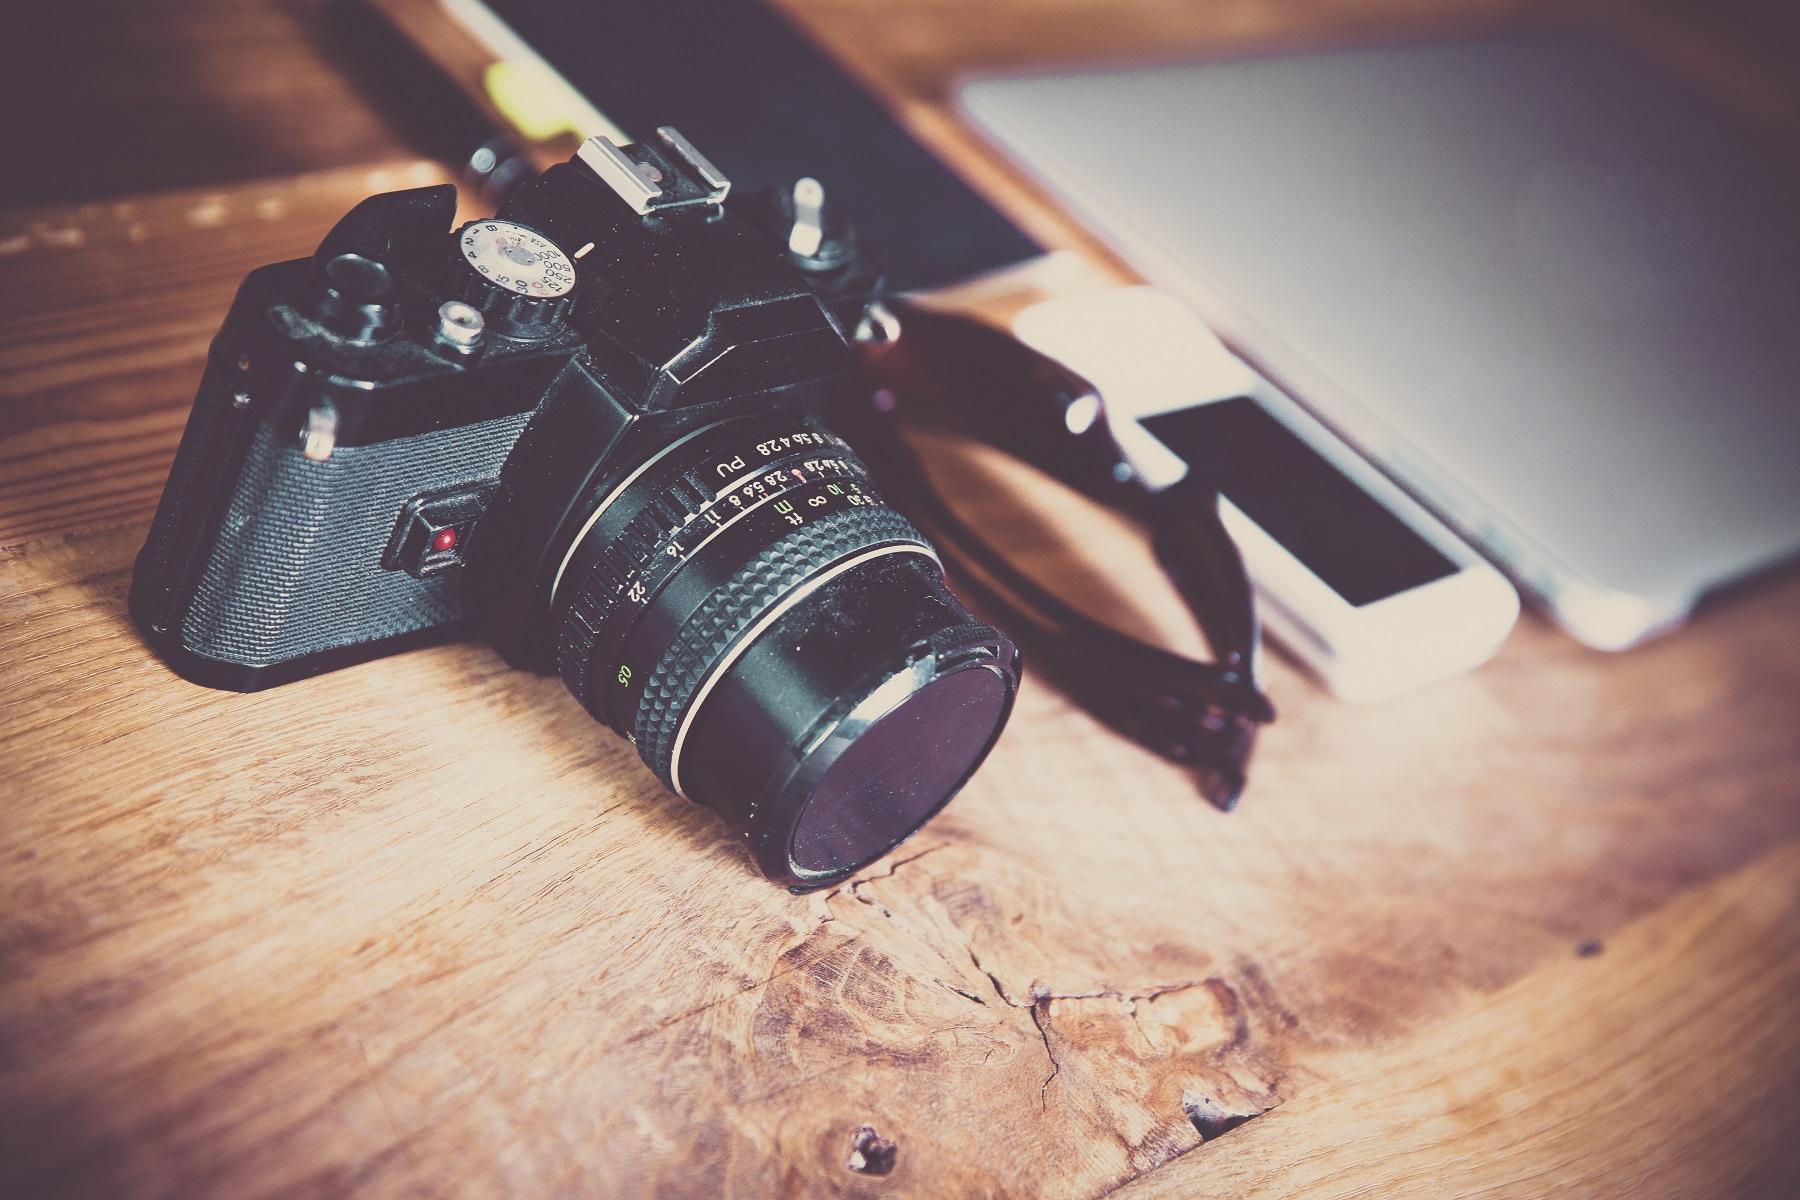 camera-581126